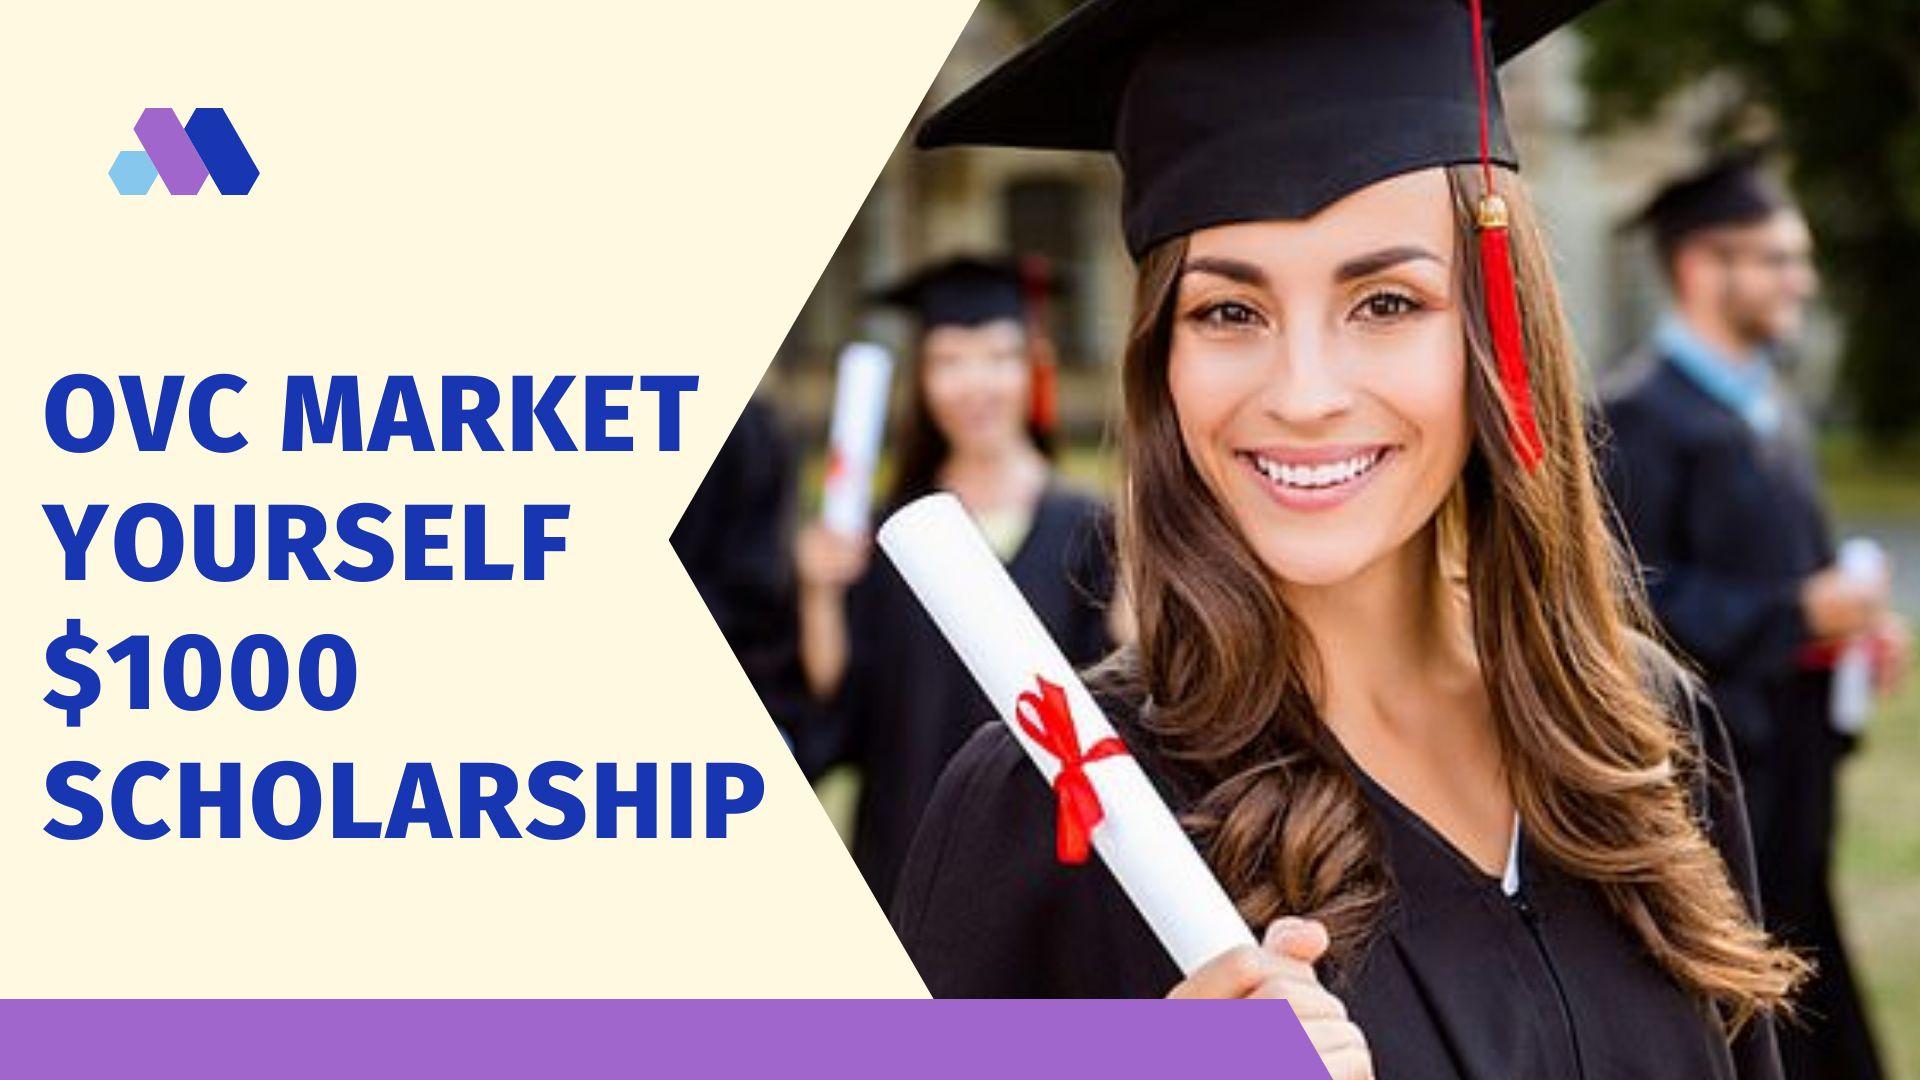 OVC Market Yourself $1000 Scholarship